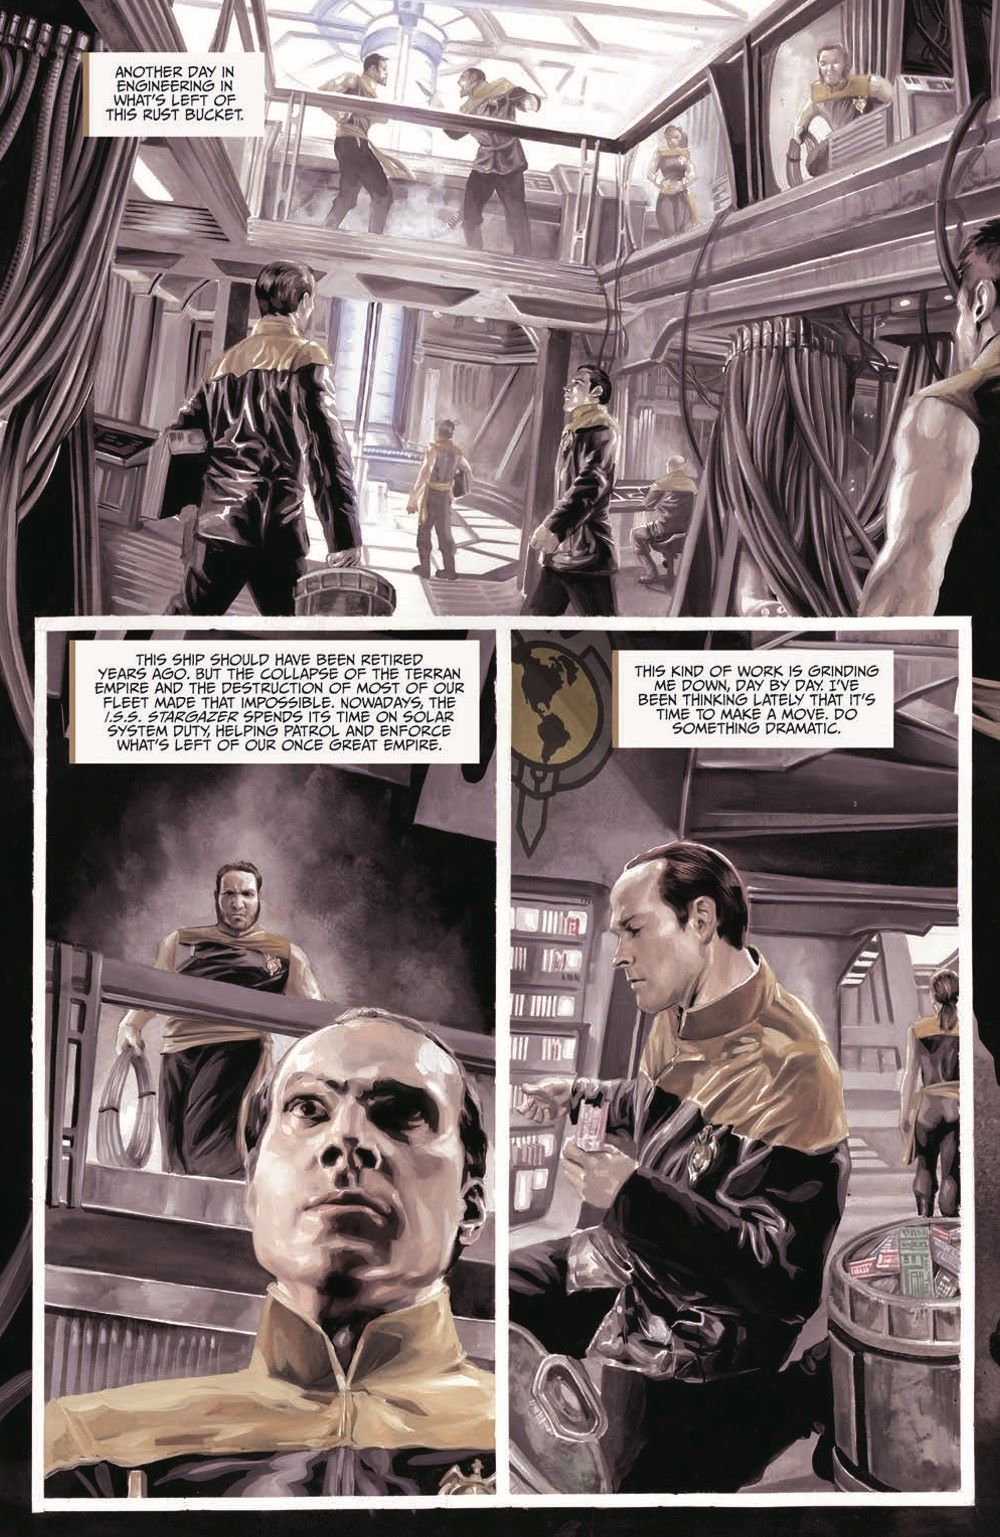 Star_Trek-TNG-MUC-pr-4 ComicList Previews: STAR TREK THE NEXT GENERATION MIRROR UNIVERSE COLLECTION TP